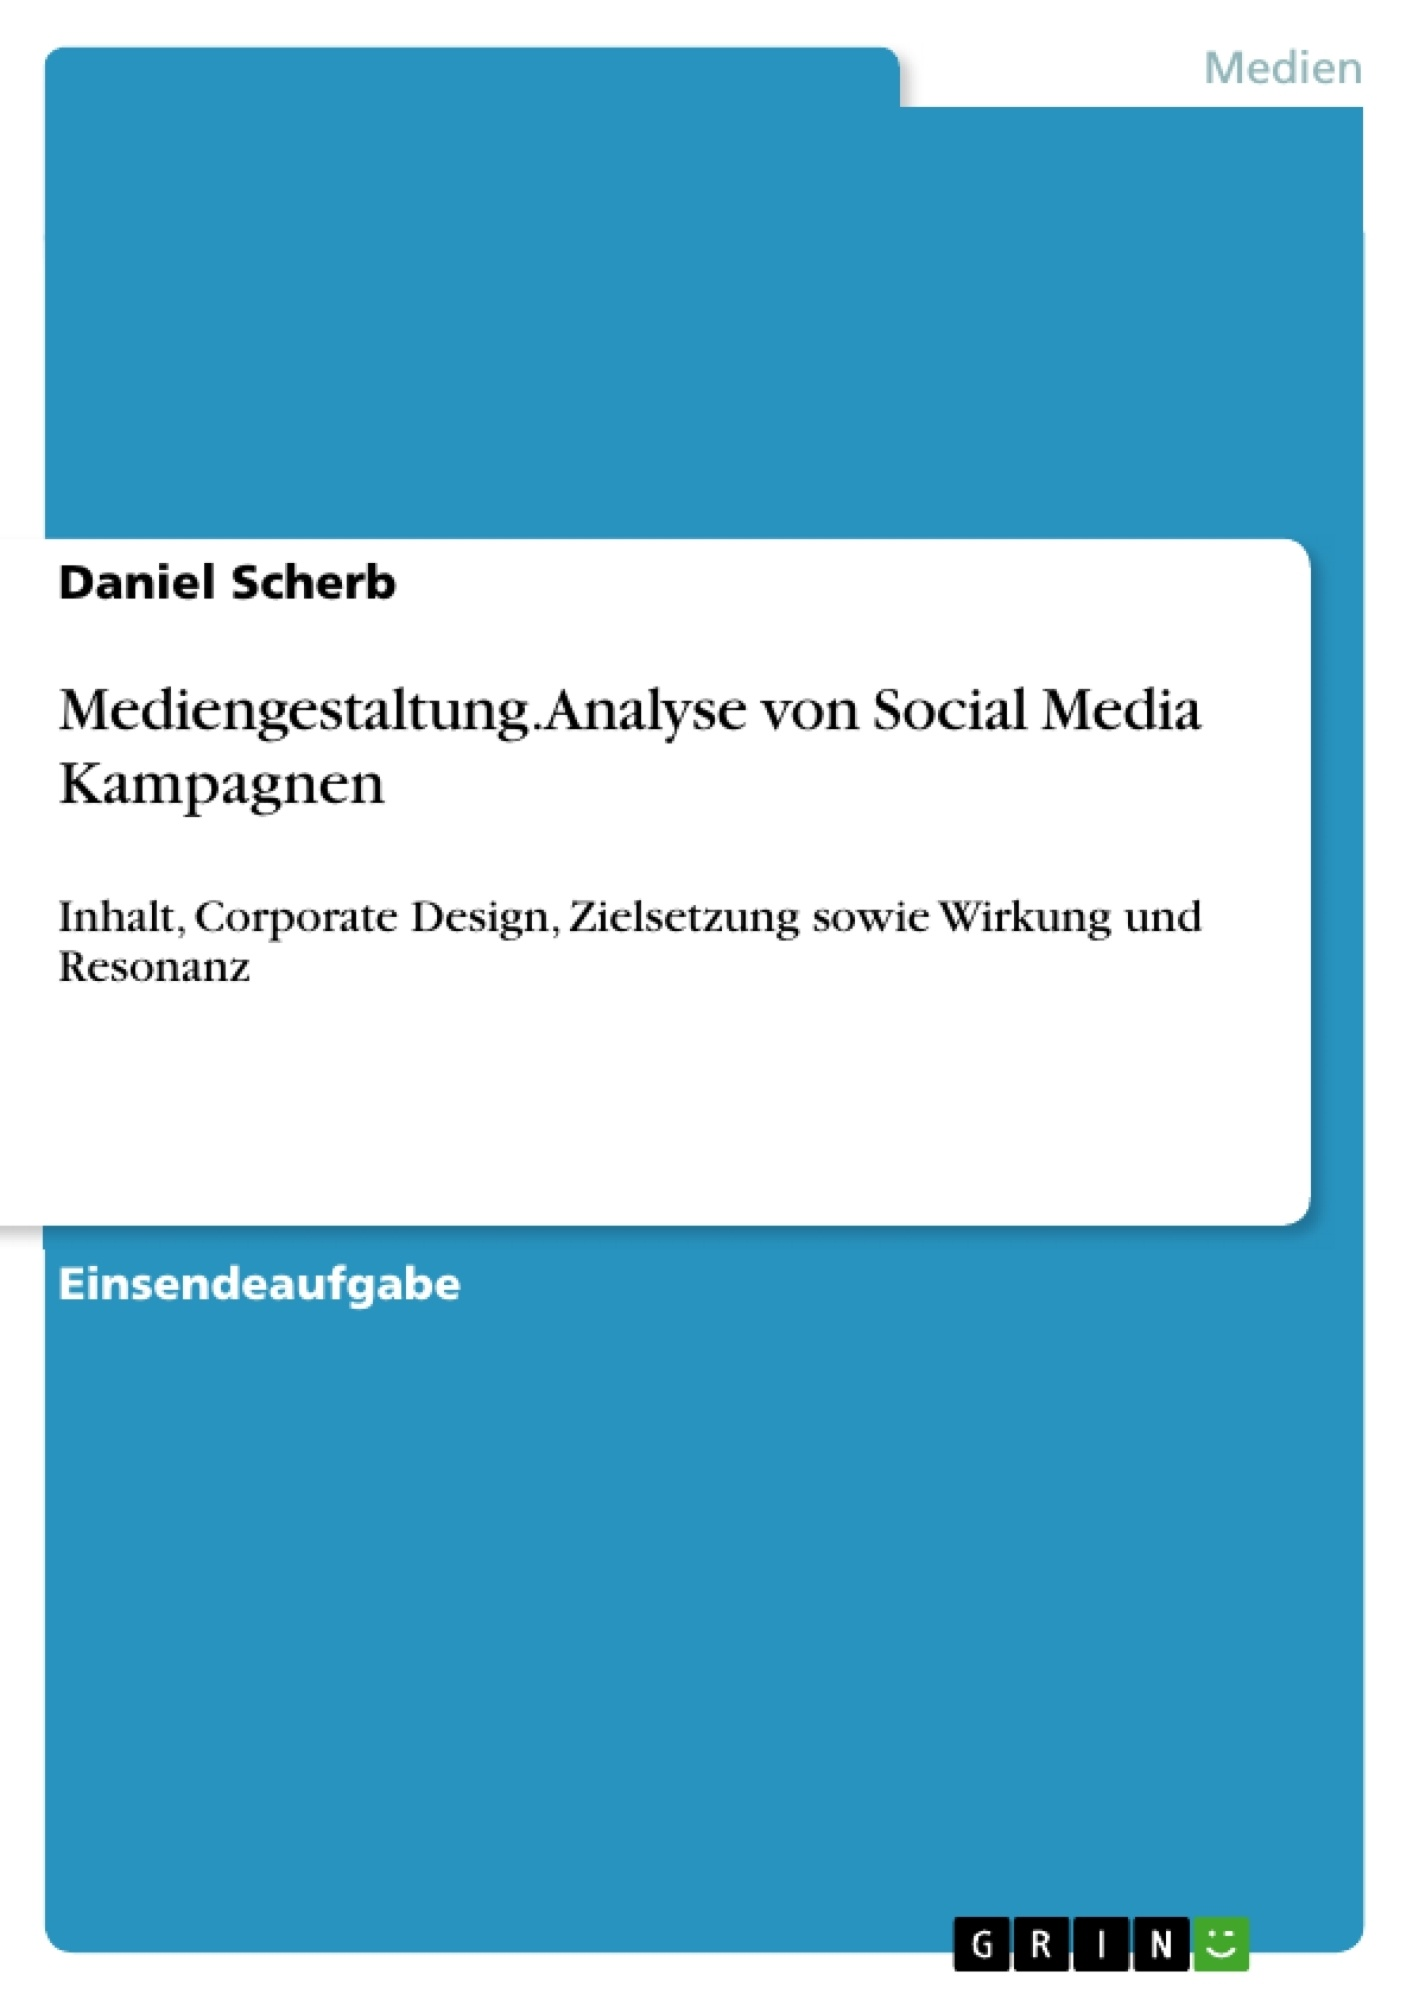 Titel: Mediengestaltung. Analyse von Social Media Kampagnen